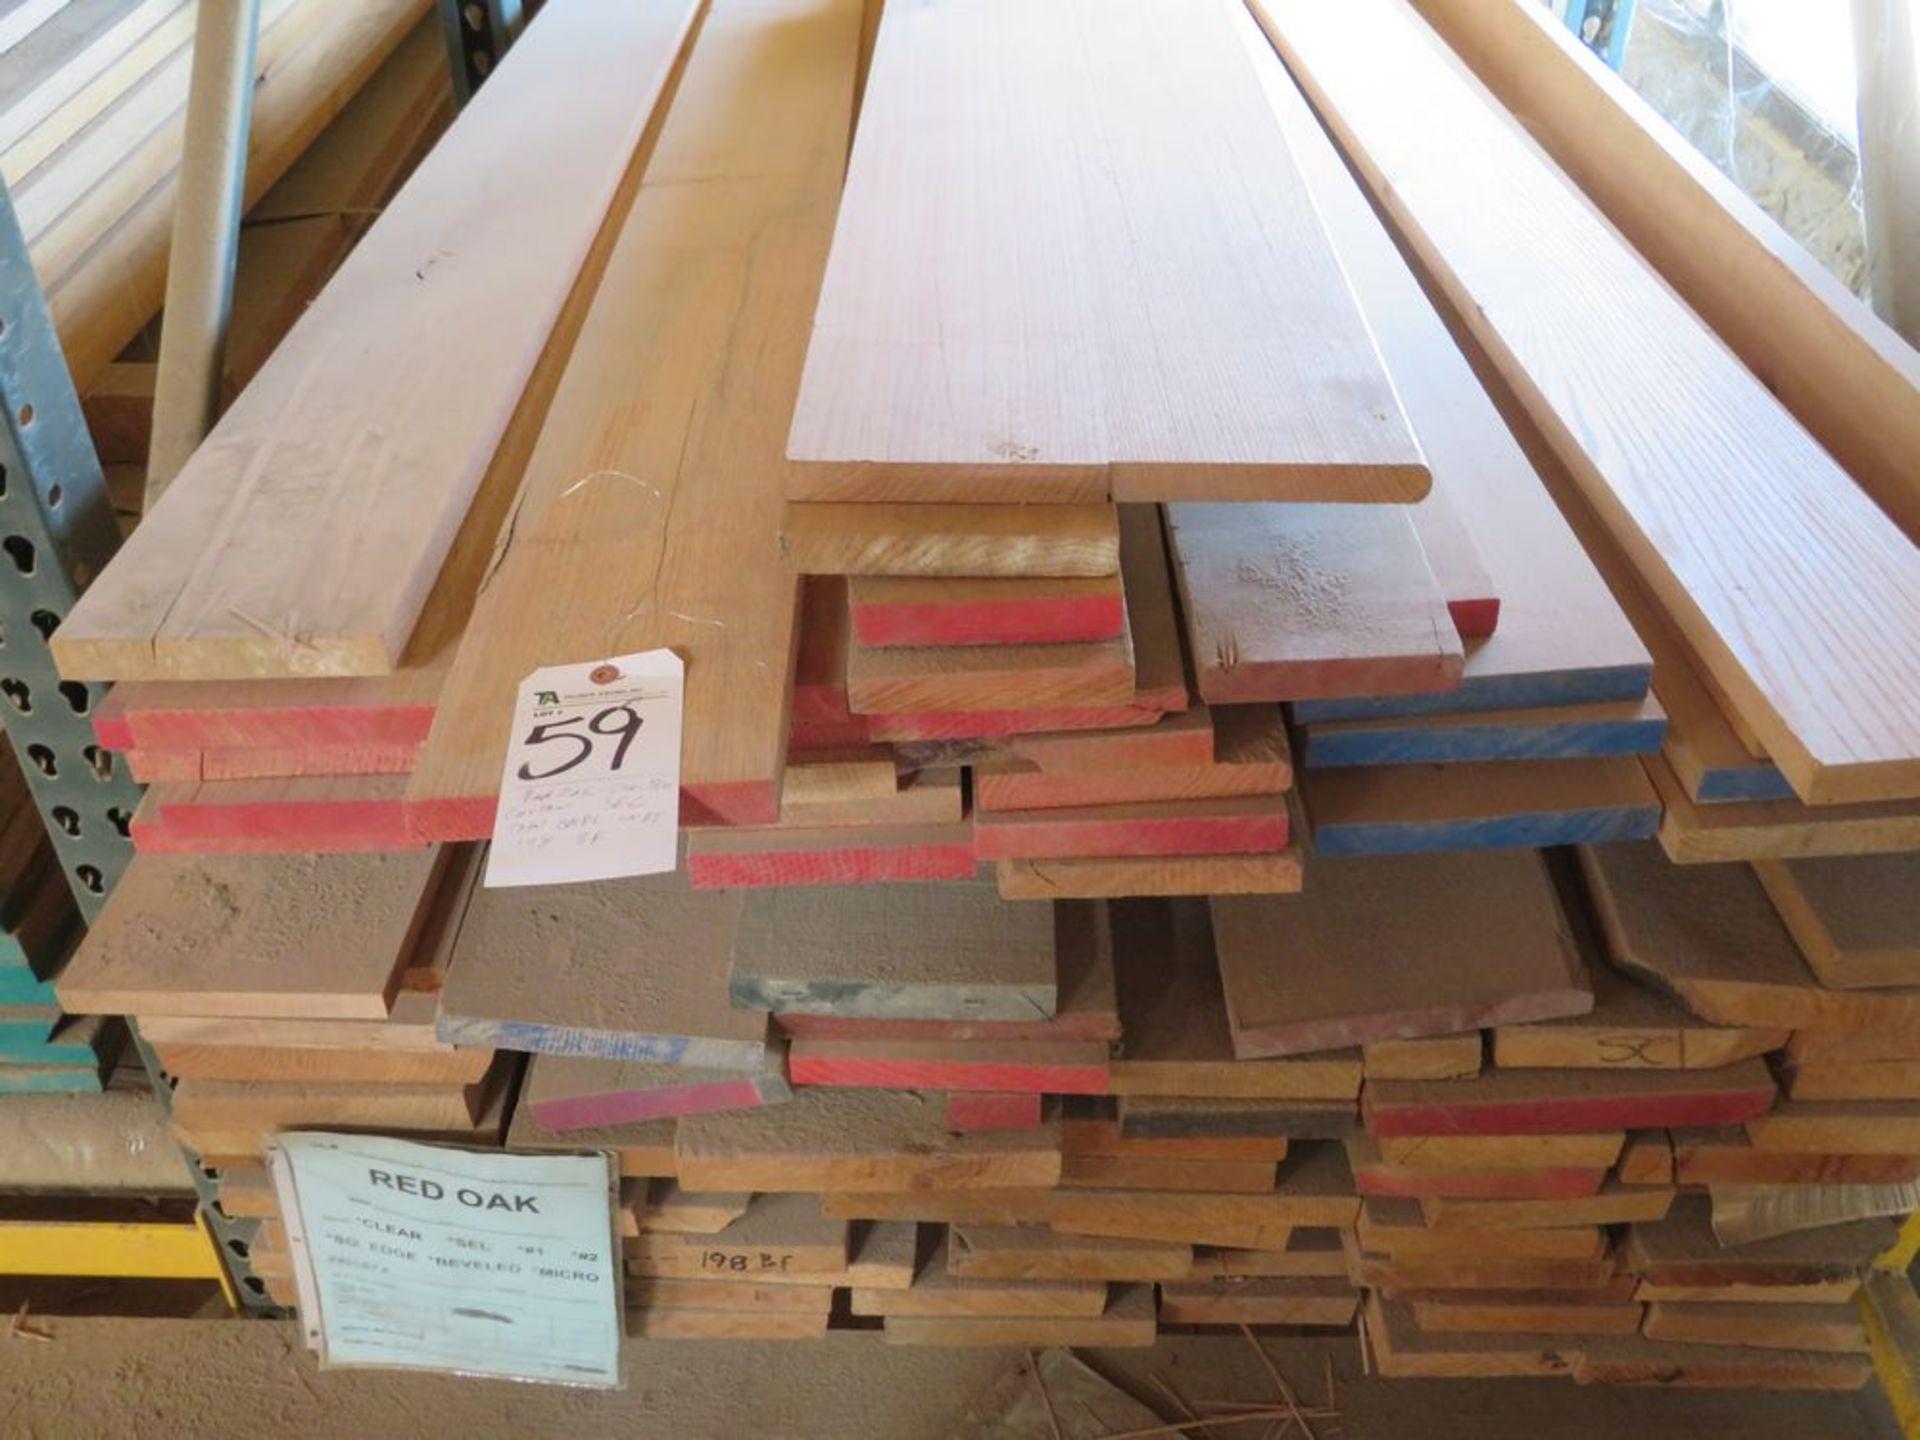 Lot 59 - (Lot) Red Oak (Rift Grade Sel) Cut Random